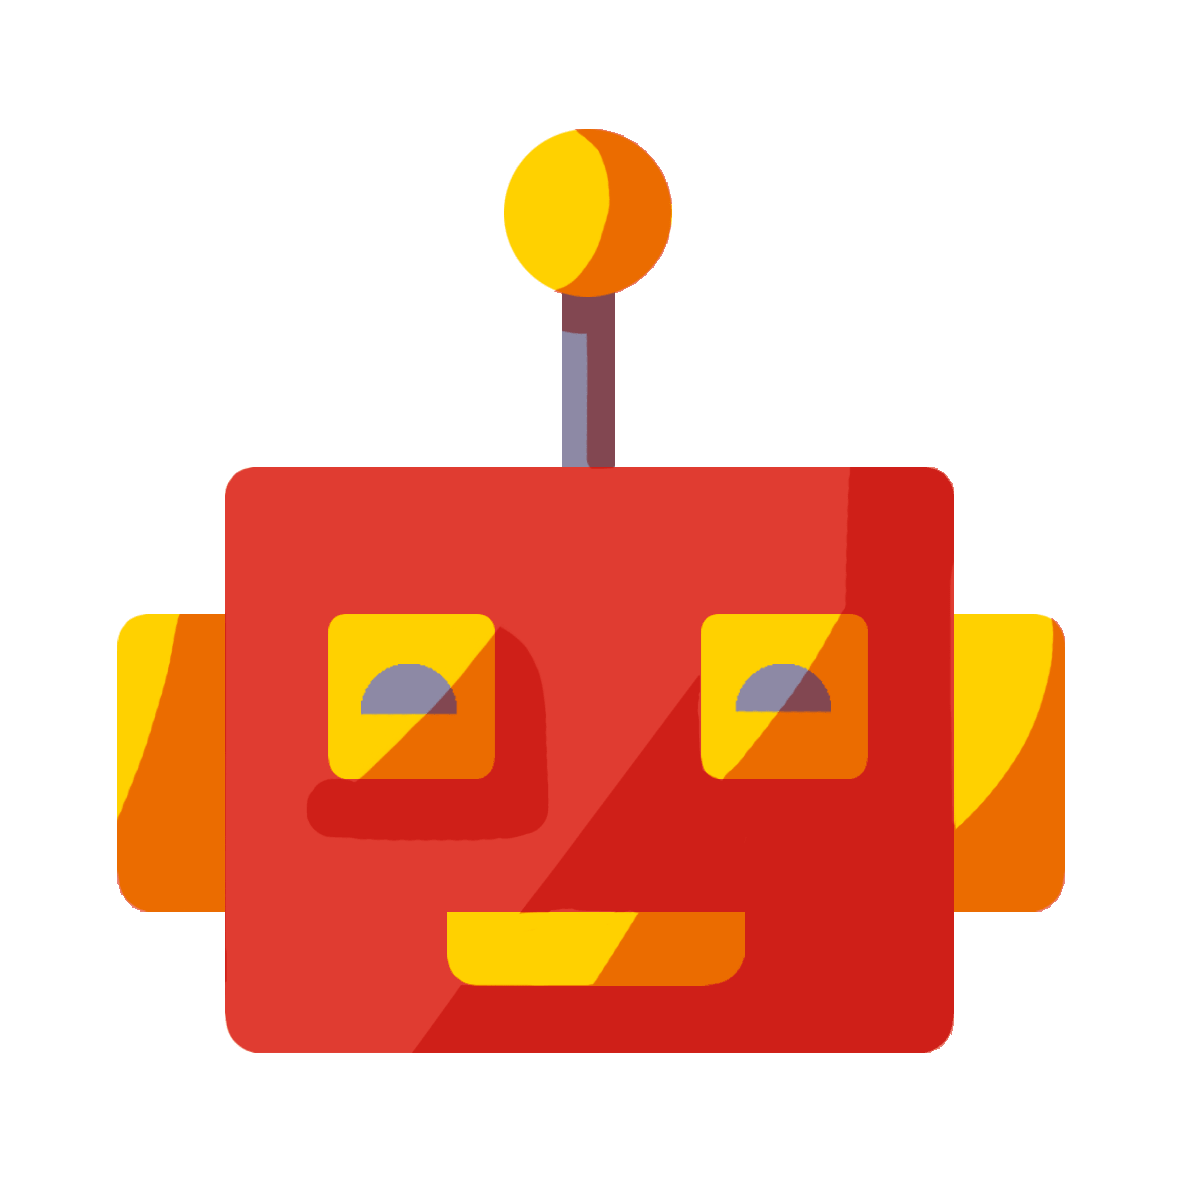 robotique-boma-france.png